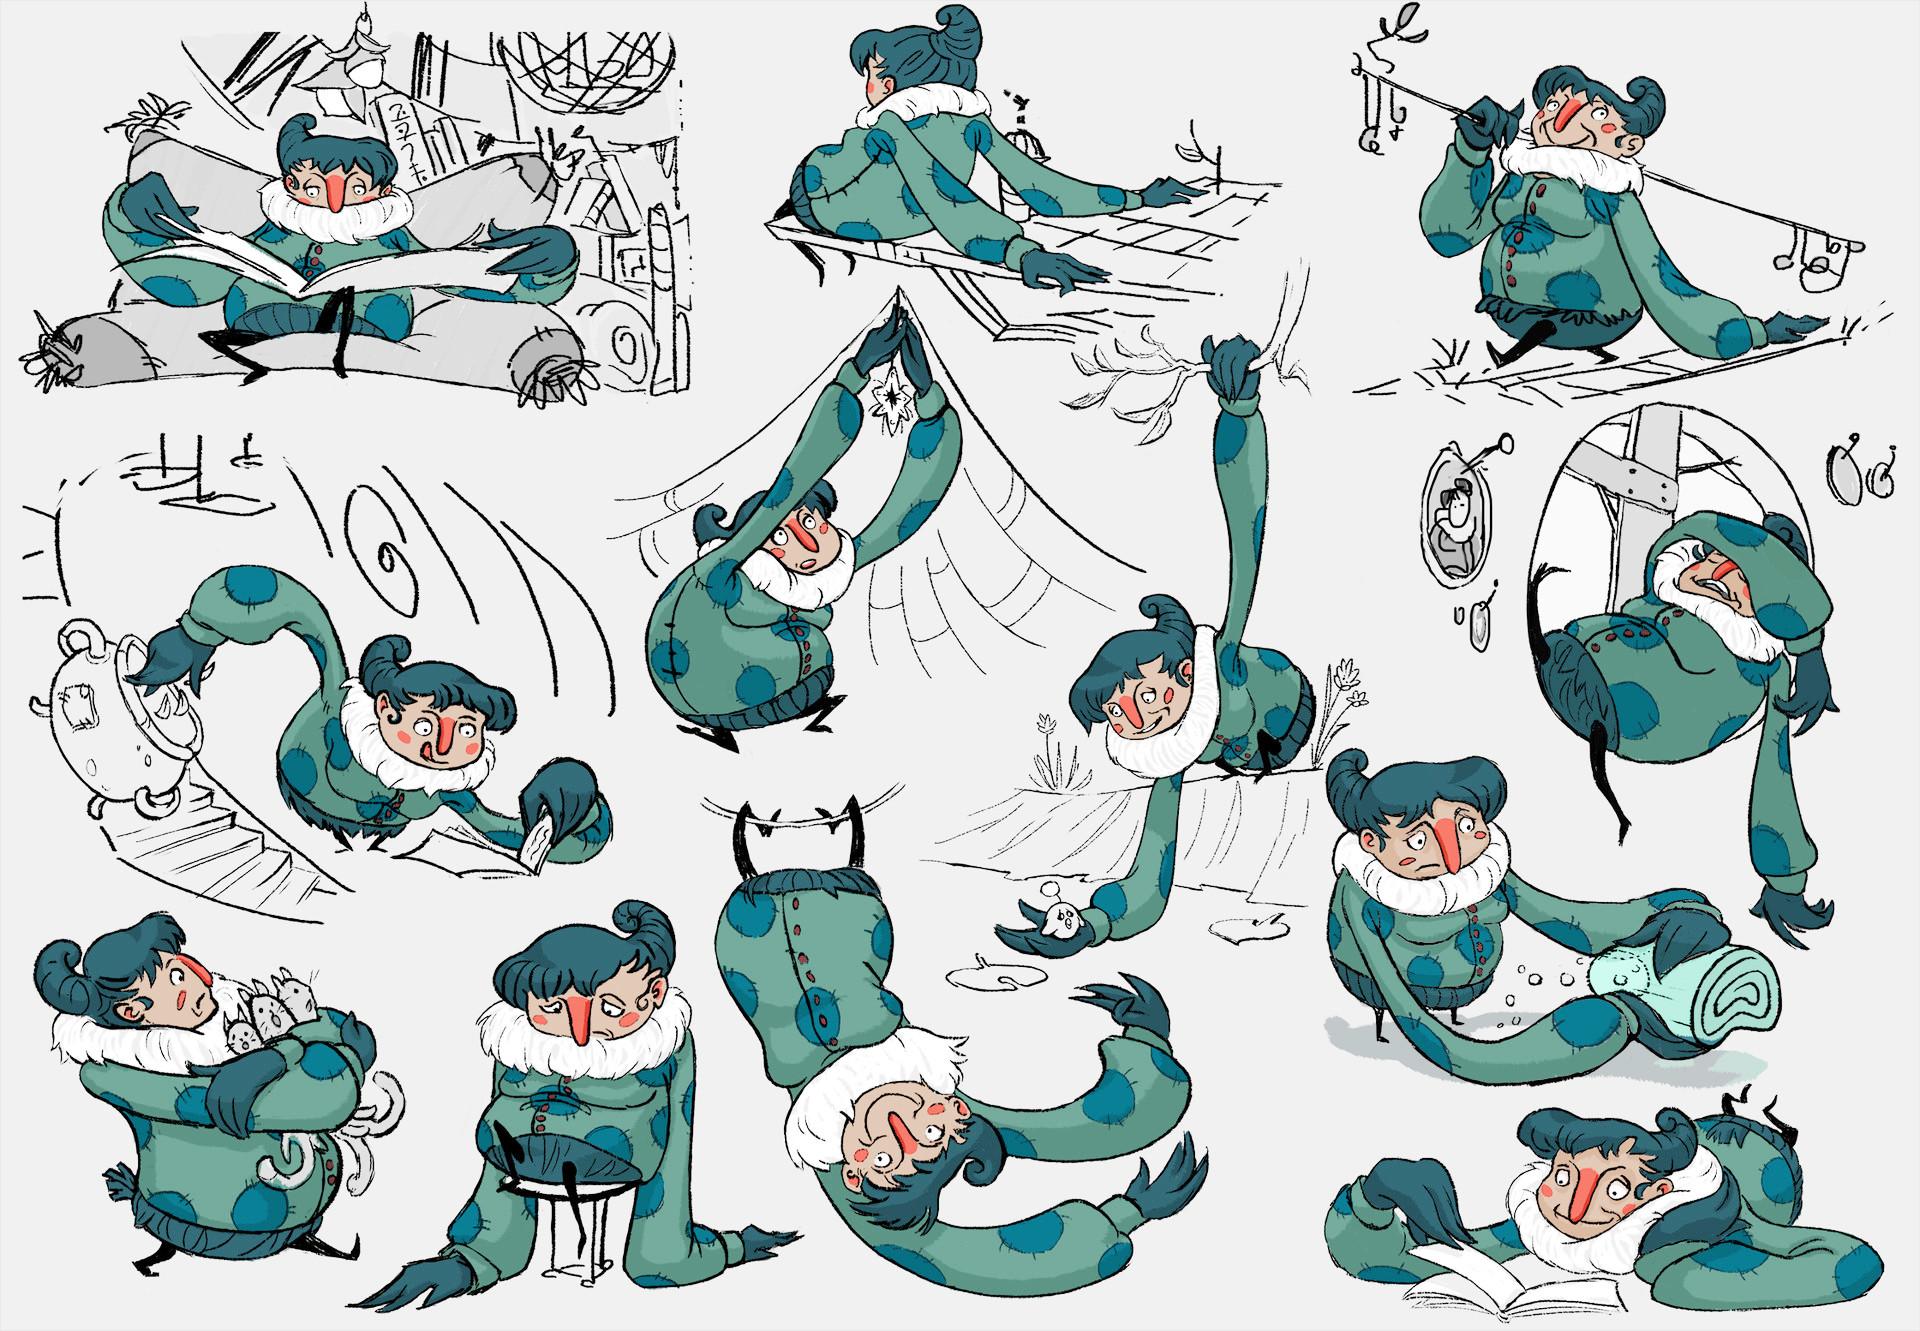 Vivien lulkowski vivien lulkowski color sloth actions wiederhergestellt